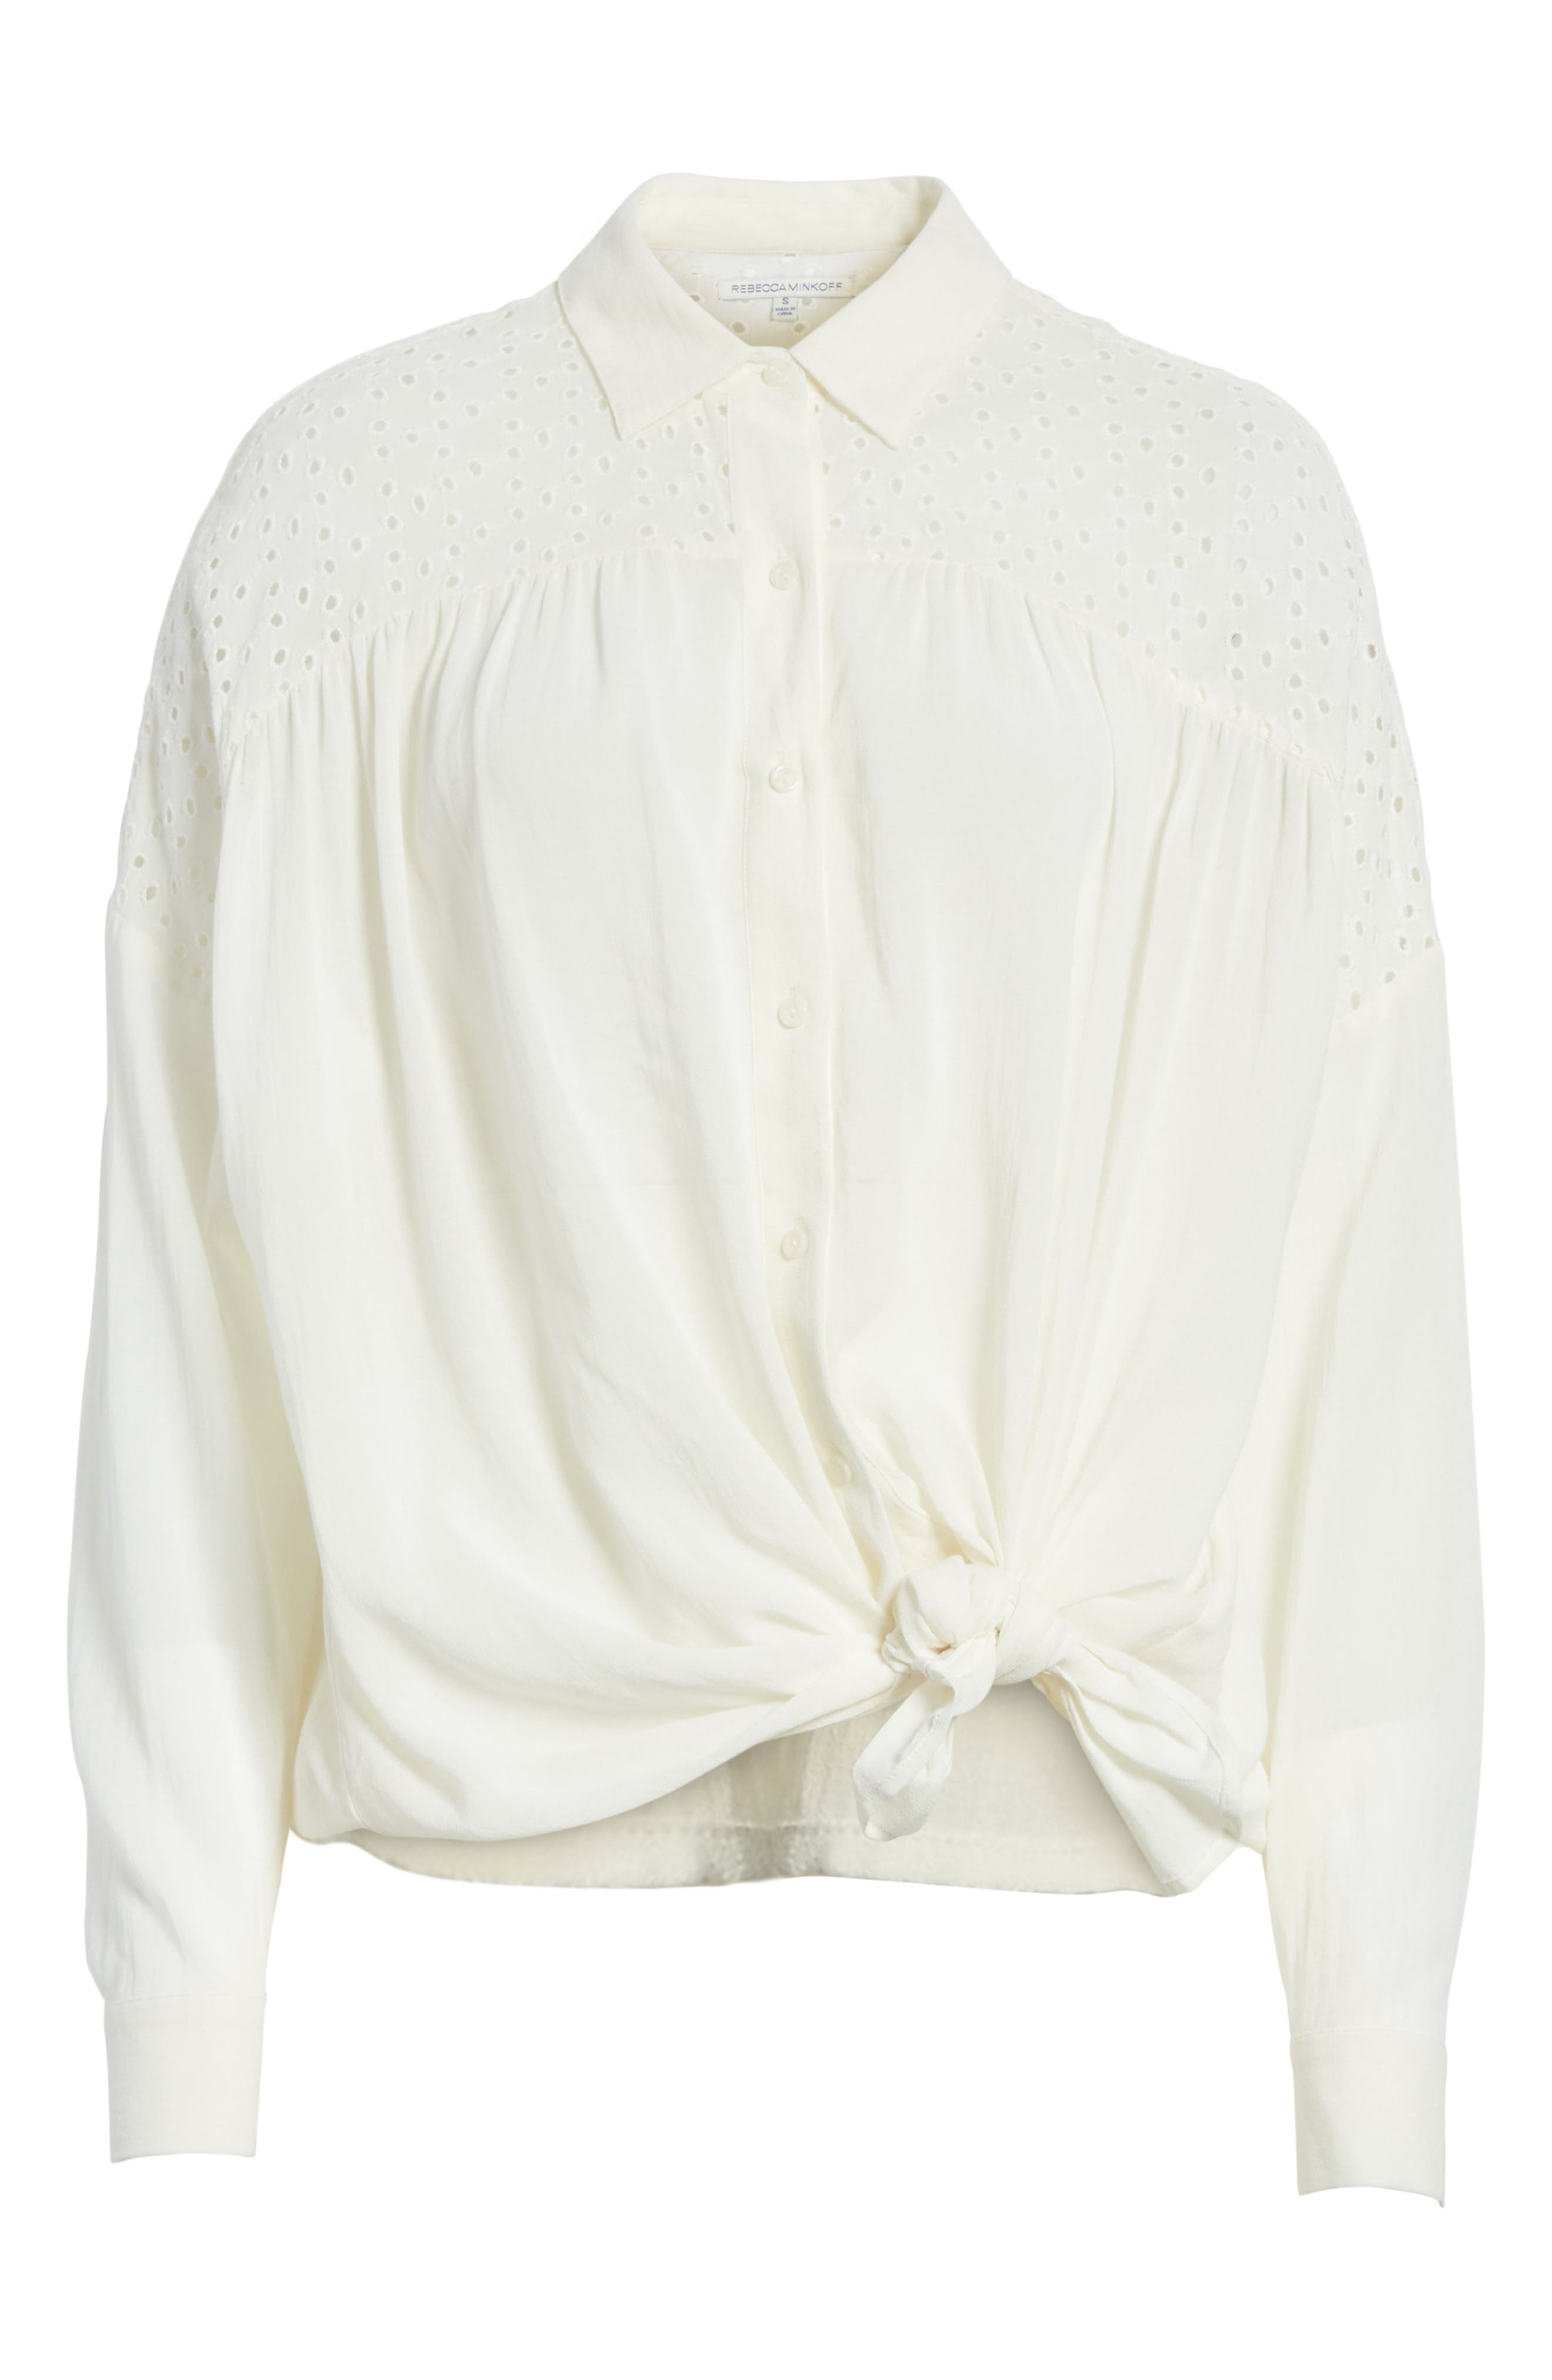 Pearla Shirt,                             Alternate thumbnail 12, color,